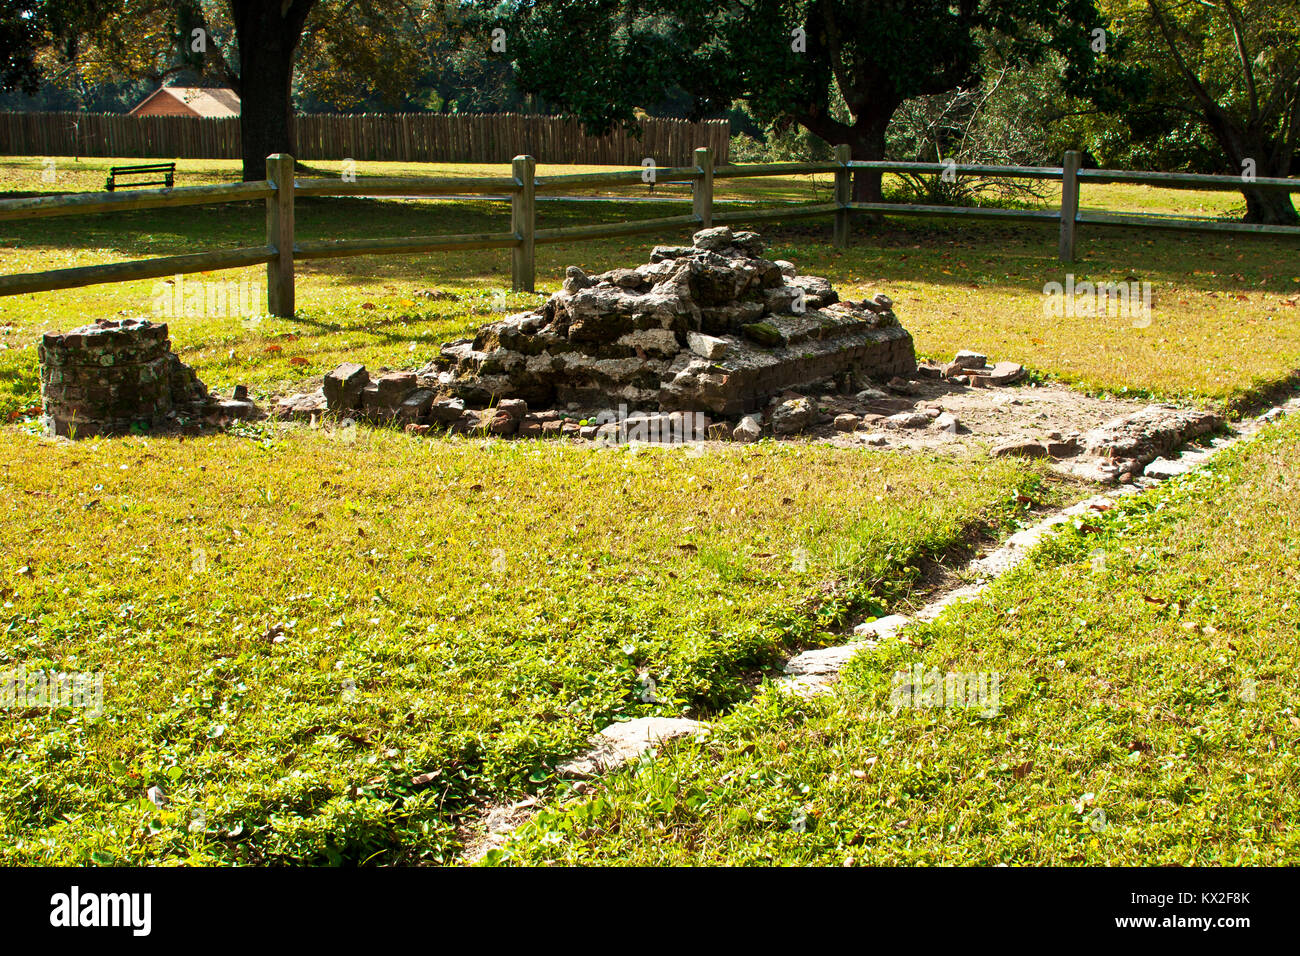 South Carolina, Charleston, Charles Towne Landing, archeological excavations, - Stock Image